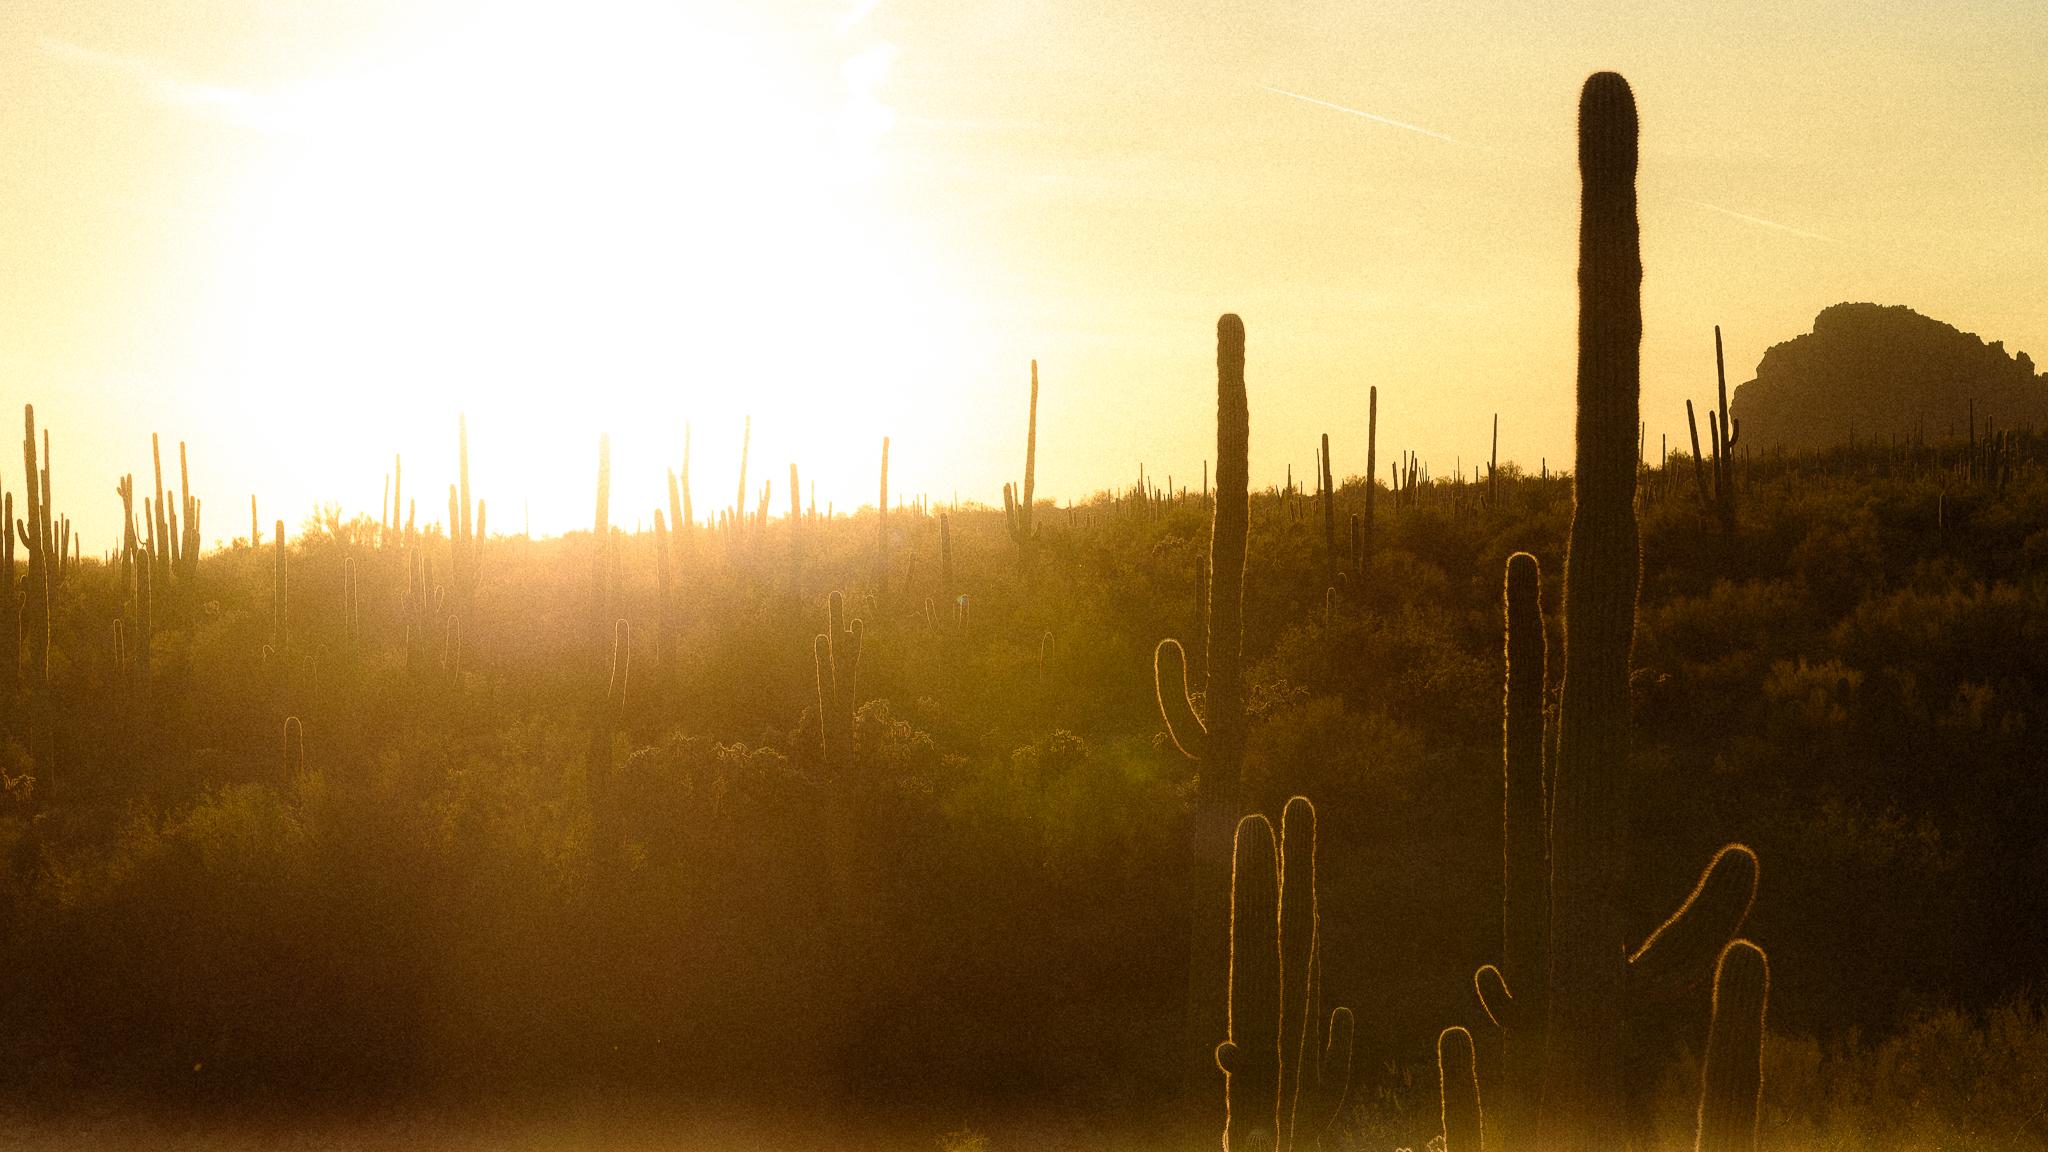 down_dusty_trails_superstition_mountains_golden_hour-2.jpg